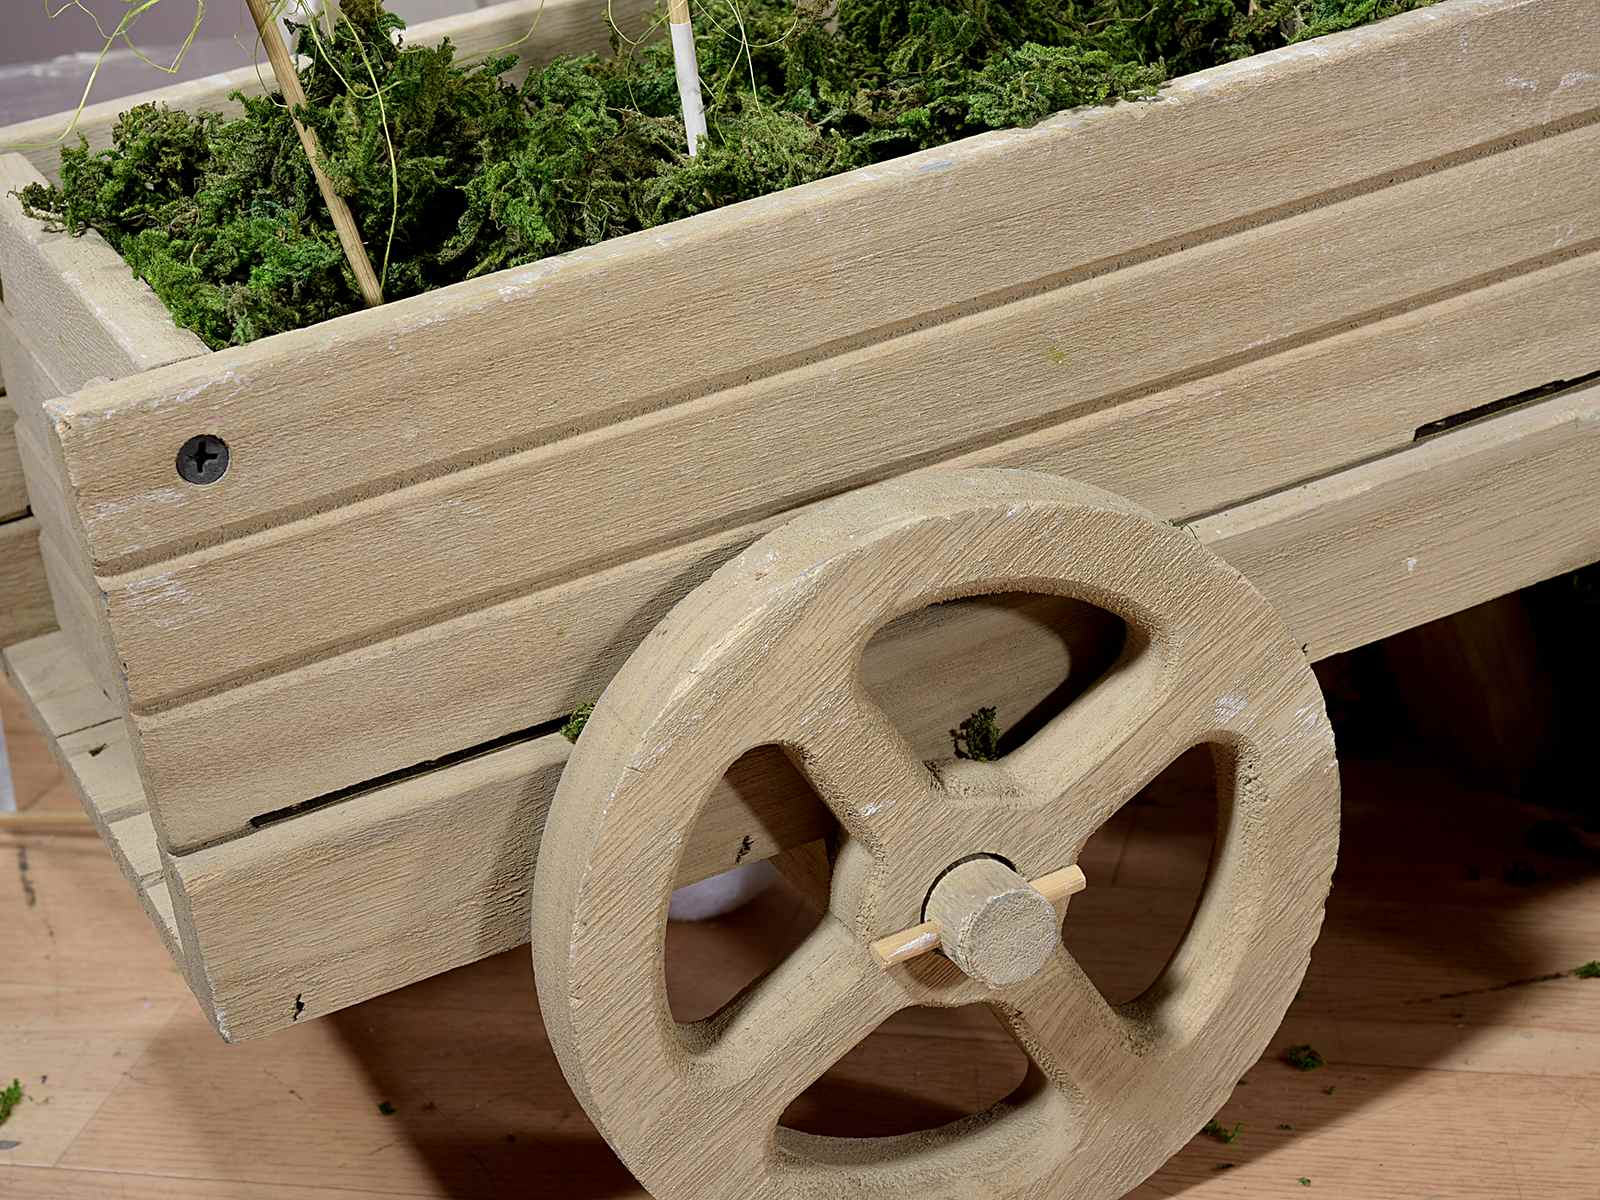 Carriola decorativa in legno art from italy - Brouette bois decorative ...